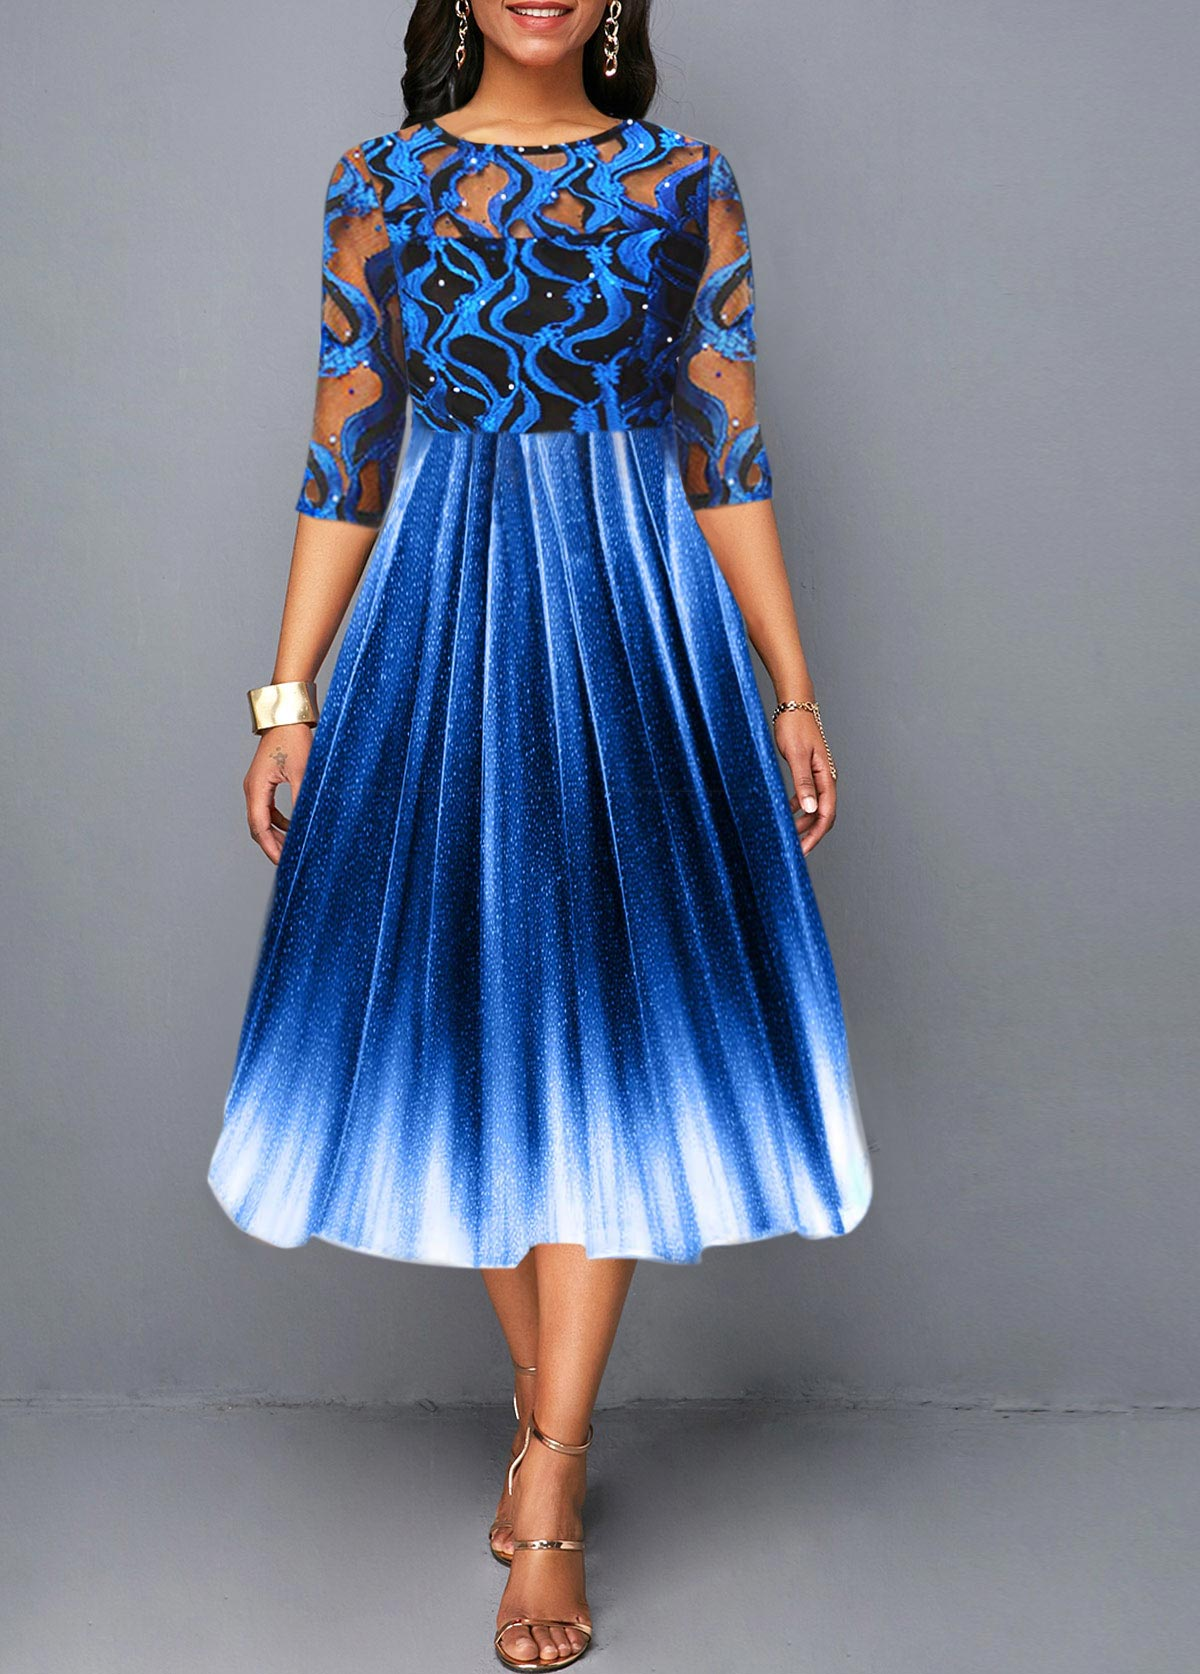 Gradient Sequin Embellished Lace Panel Dress